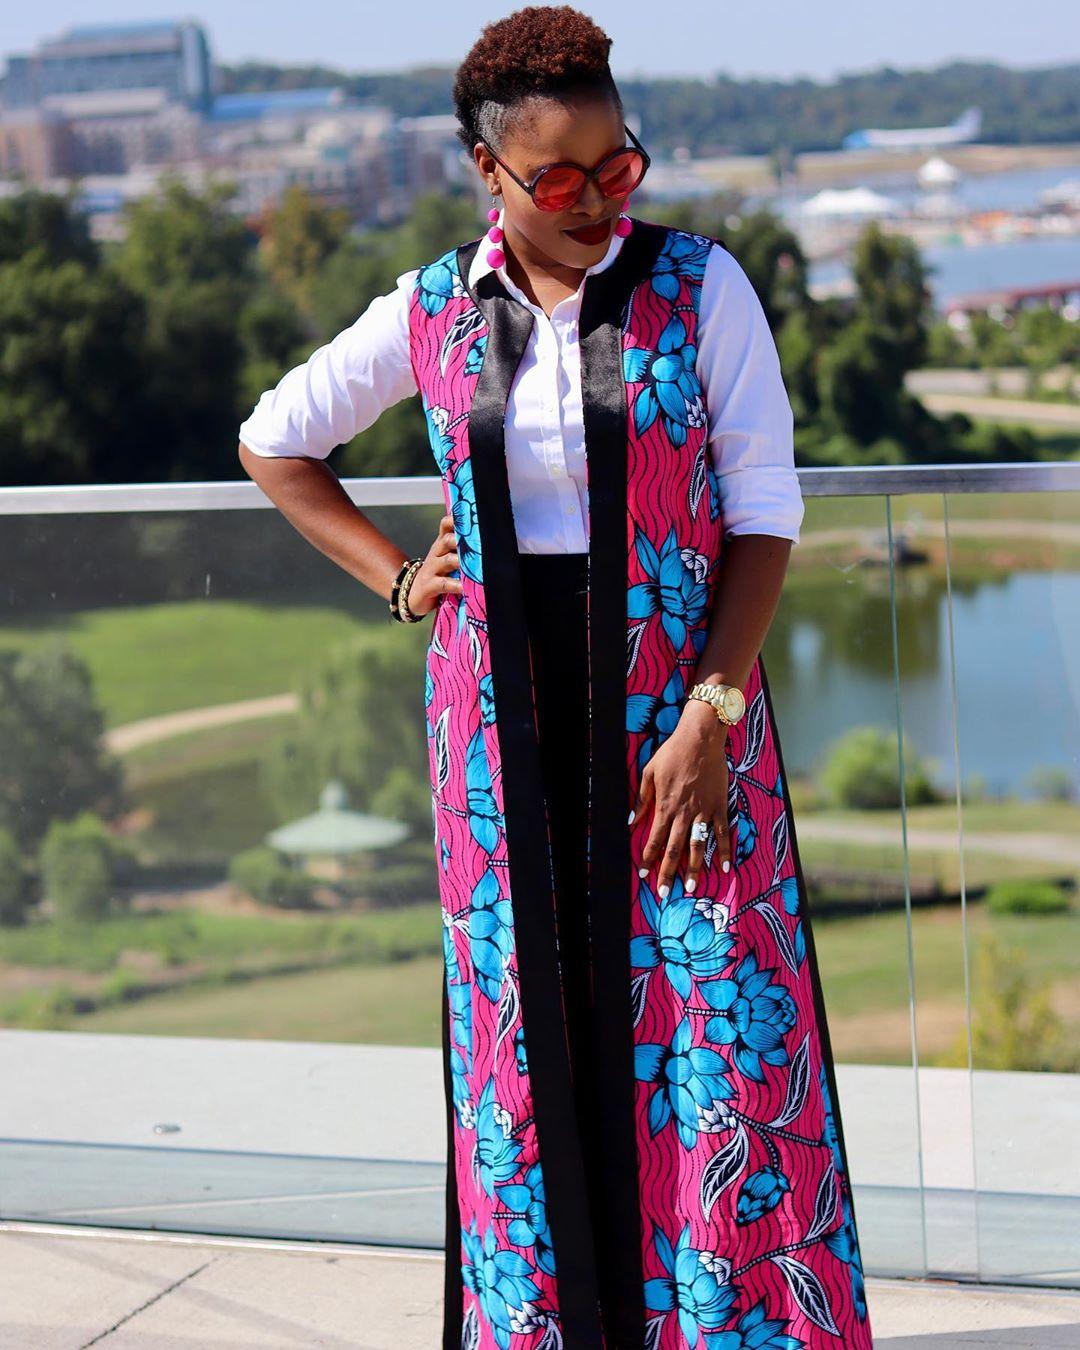 Ankara Kimono Kinds 2020 : Fashionable Vogue Designs You Should Rock